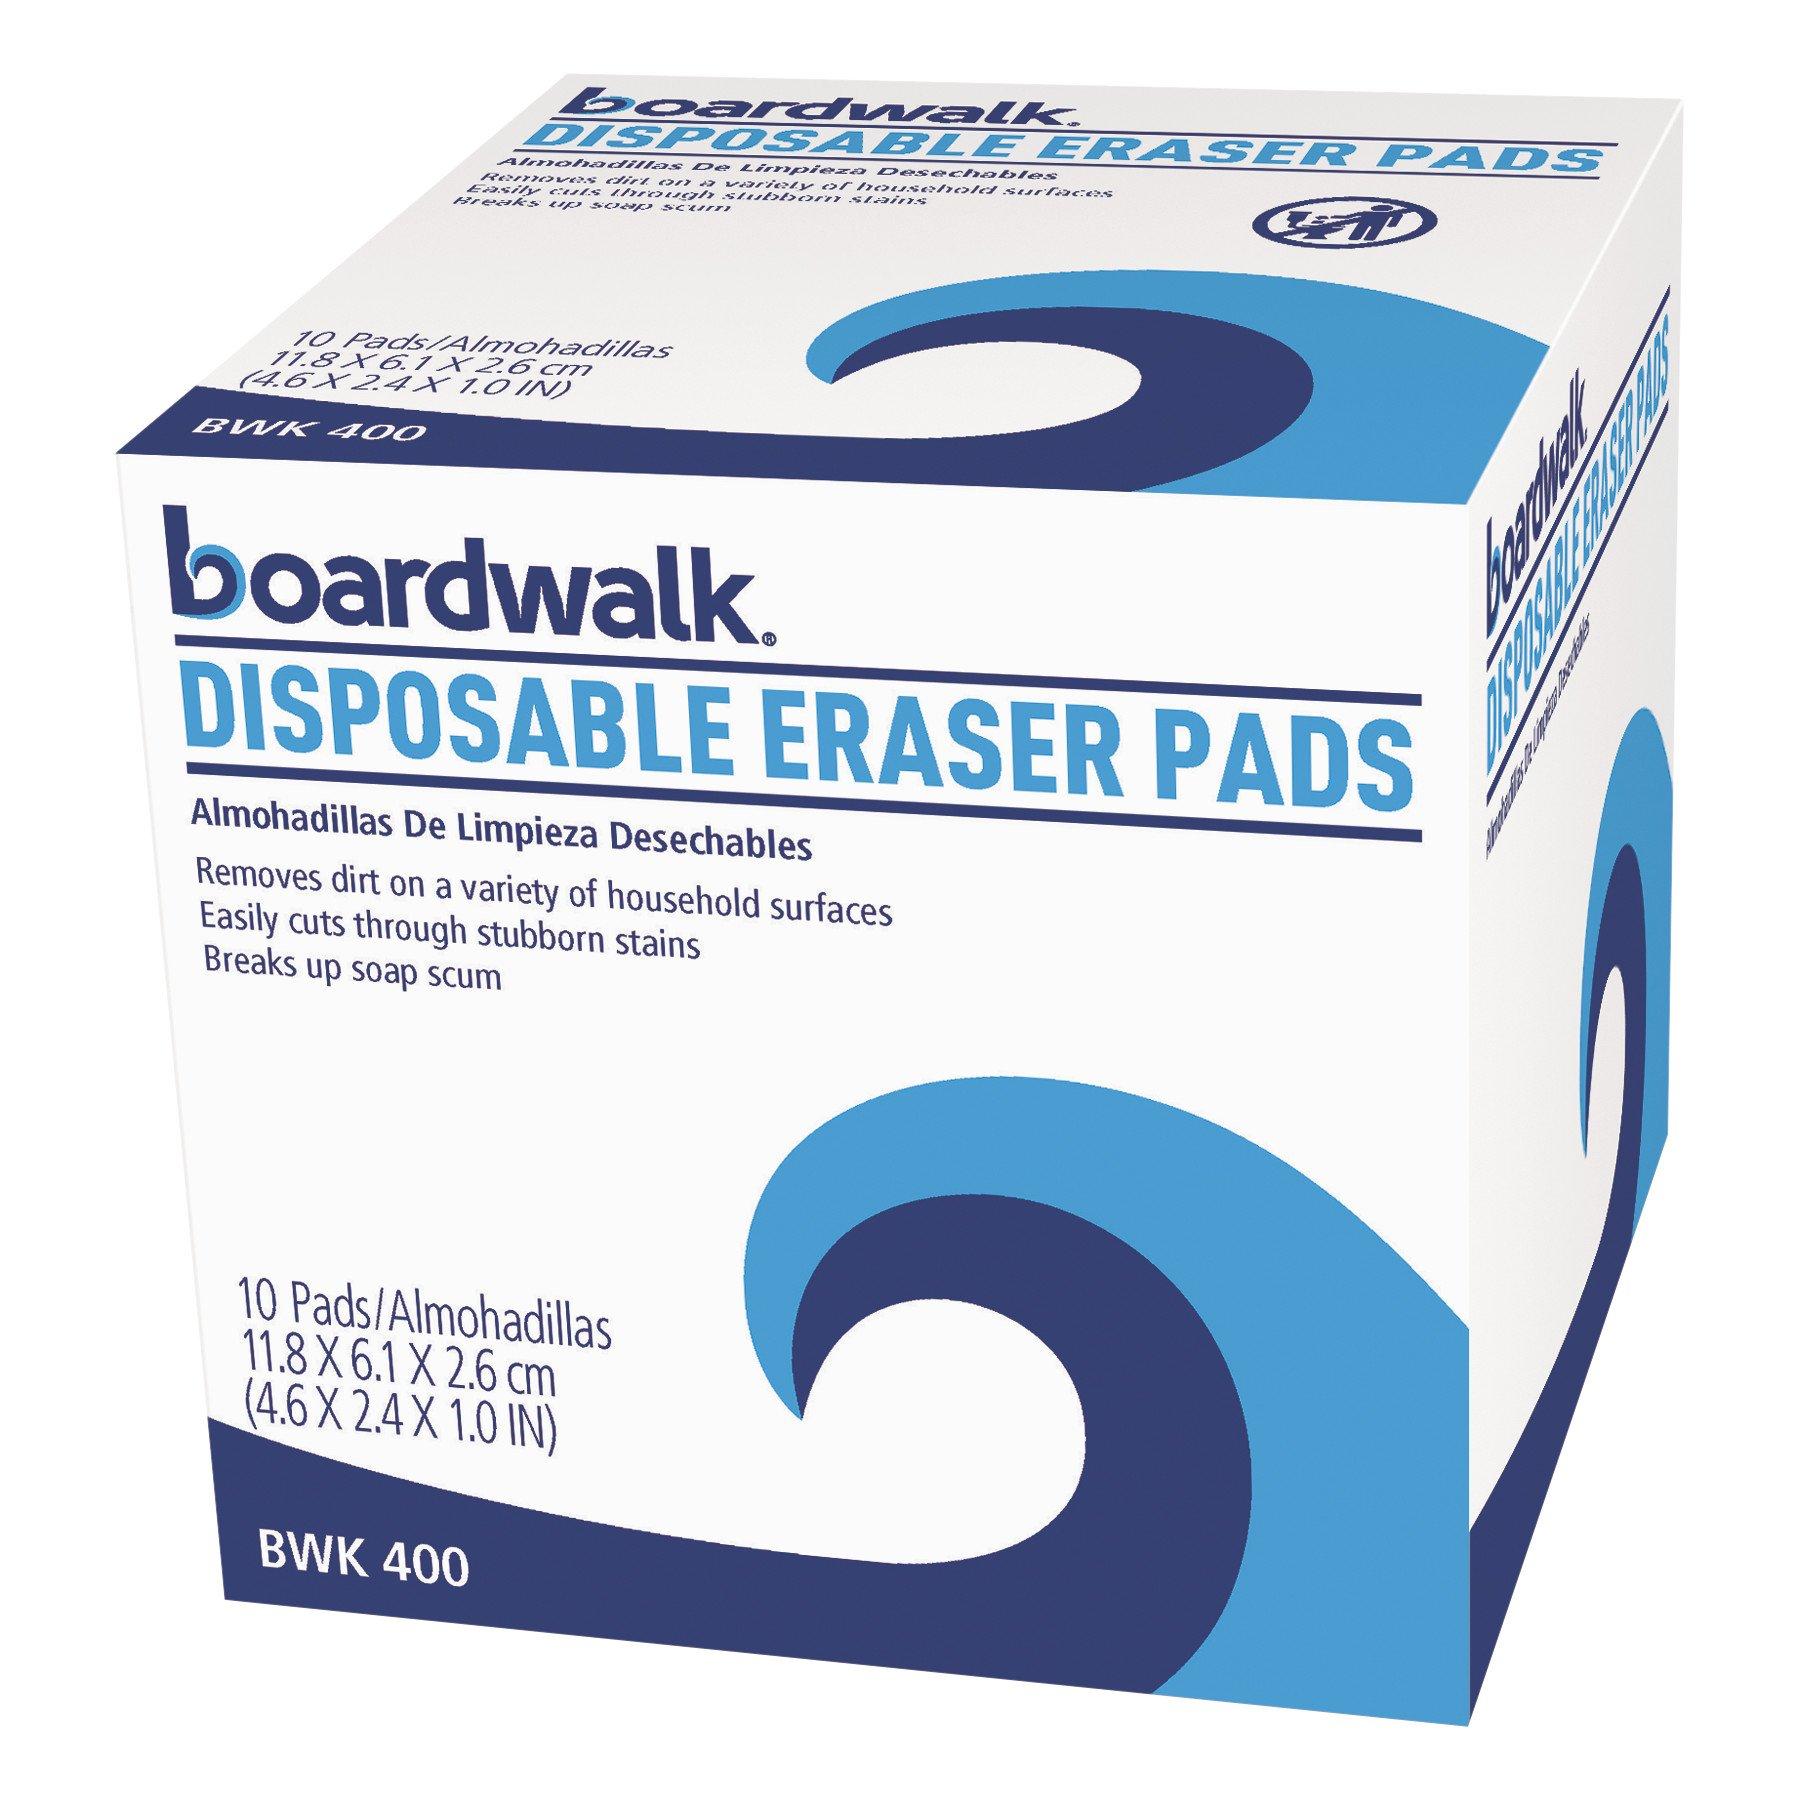 Boardwalk BWK 400 Disposable Eraser Pads, White (Pack of 10)